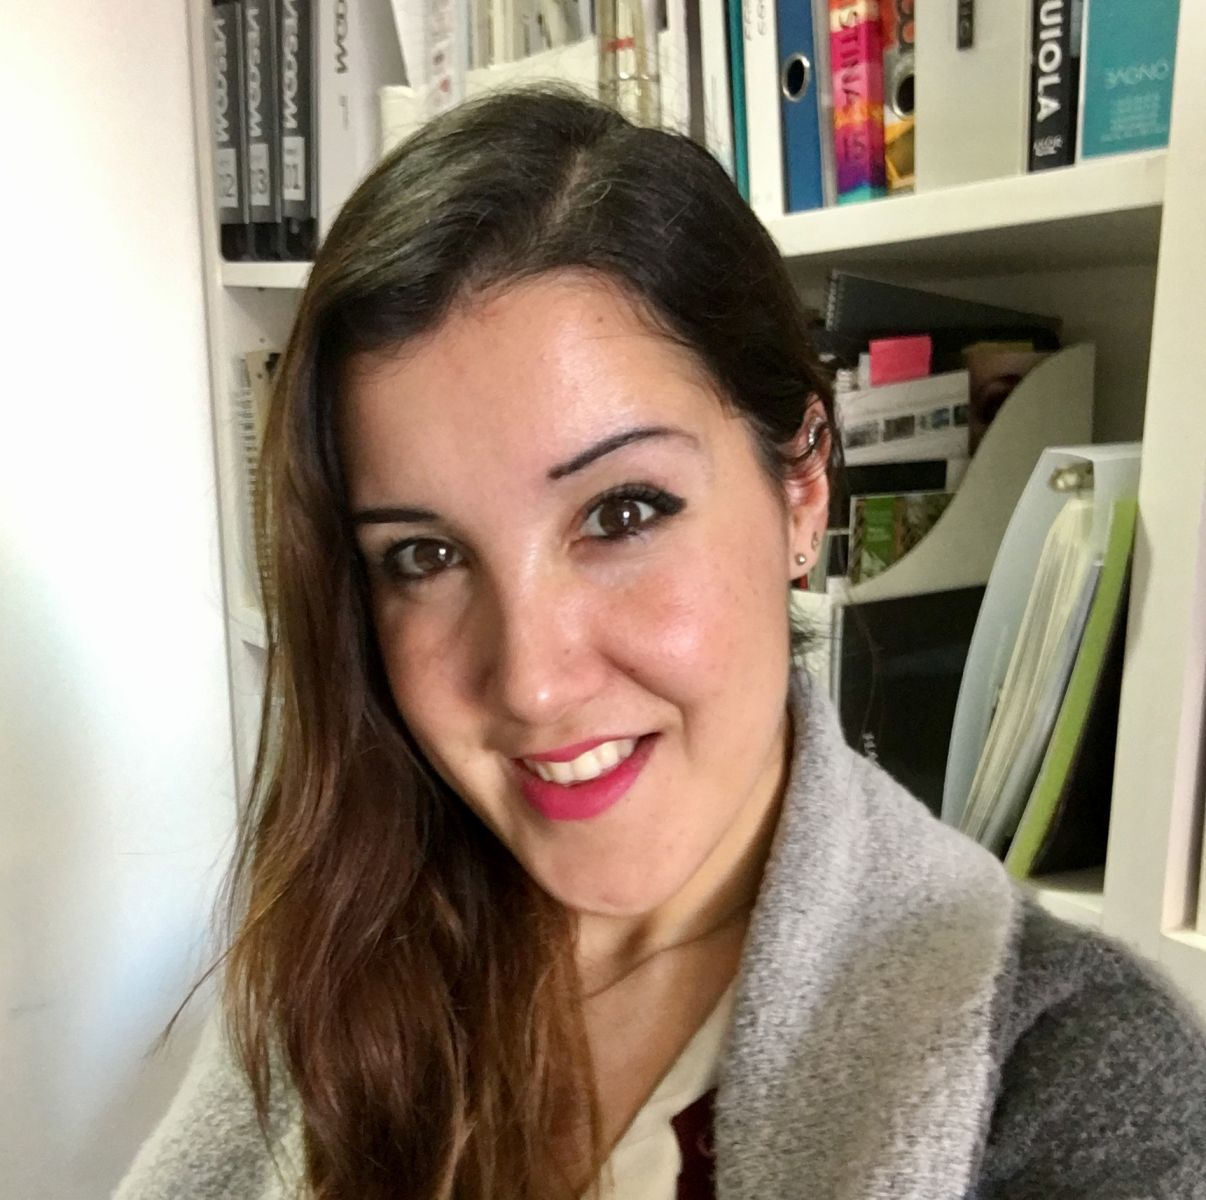 Paola Quesada Tortoriello